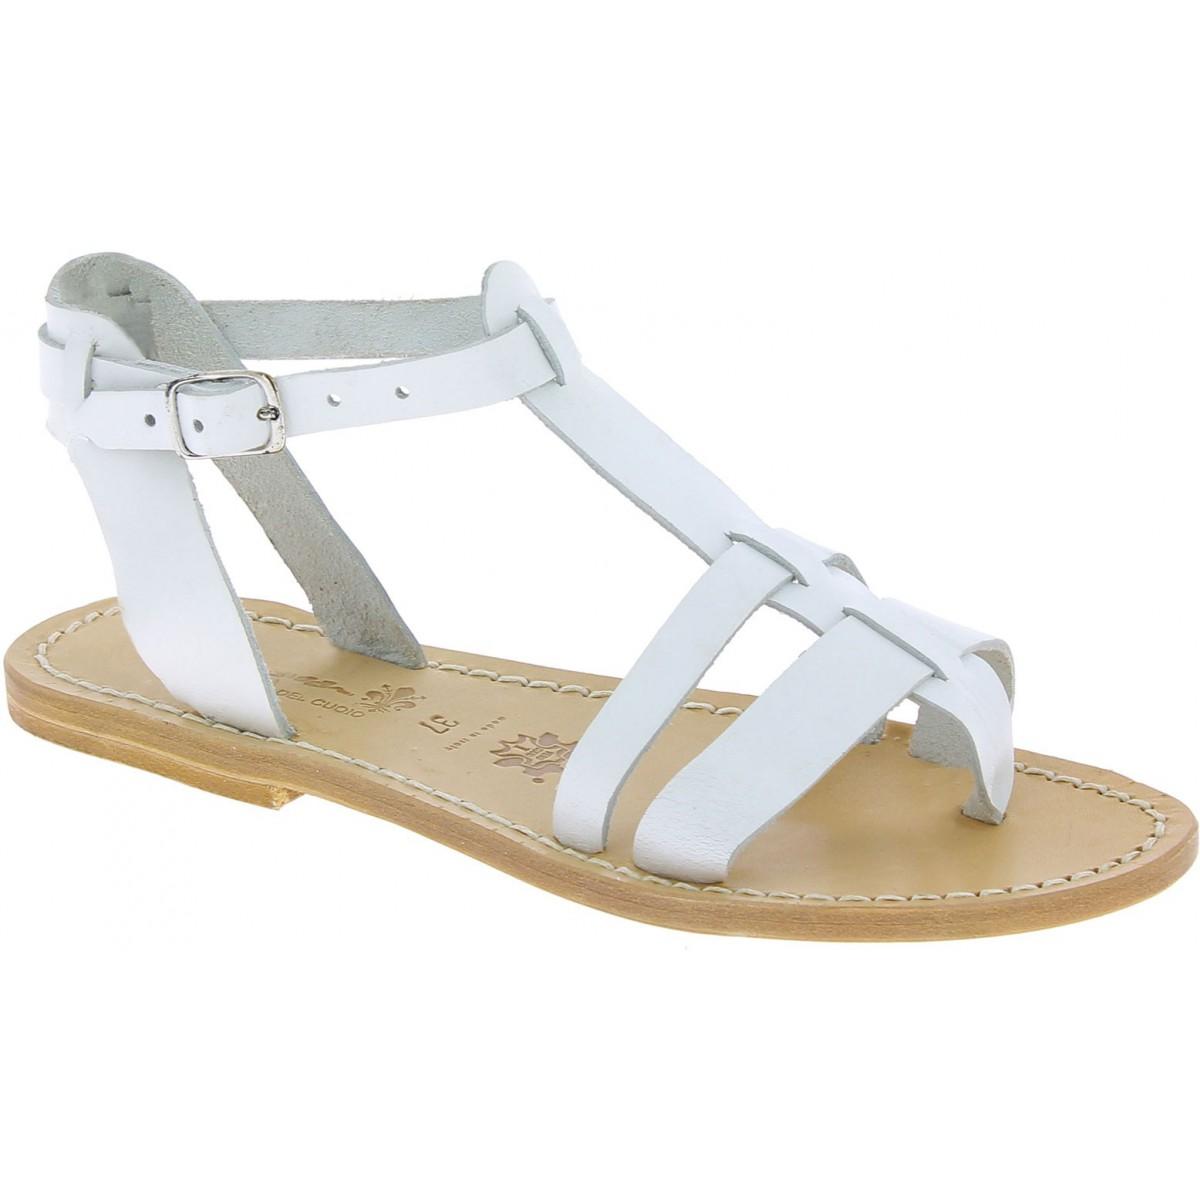 flat white leather sandals Handmade